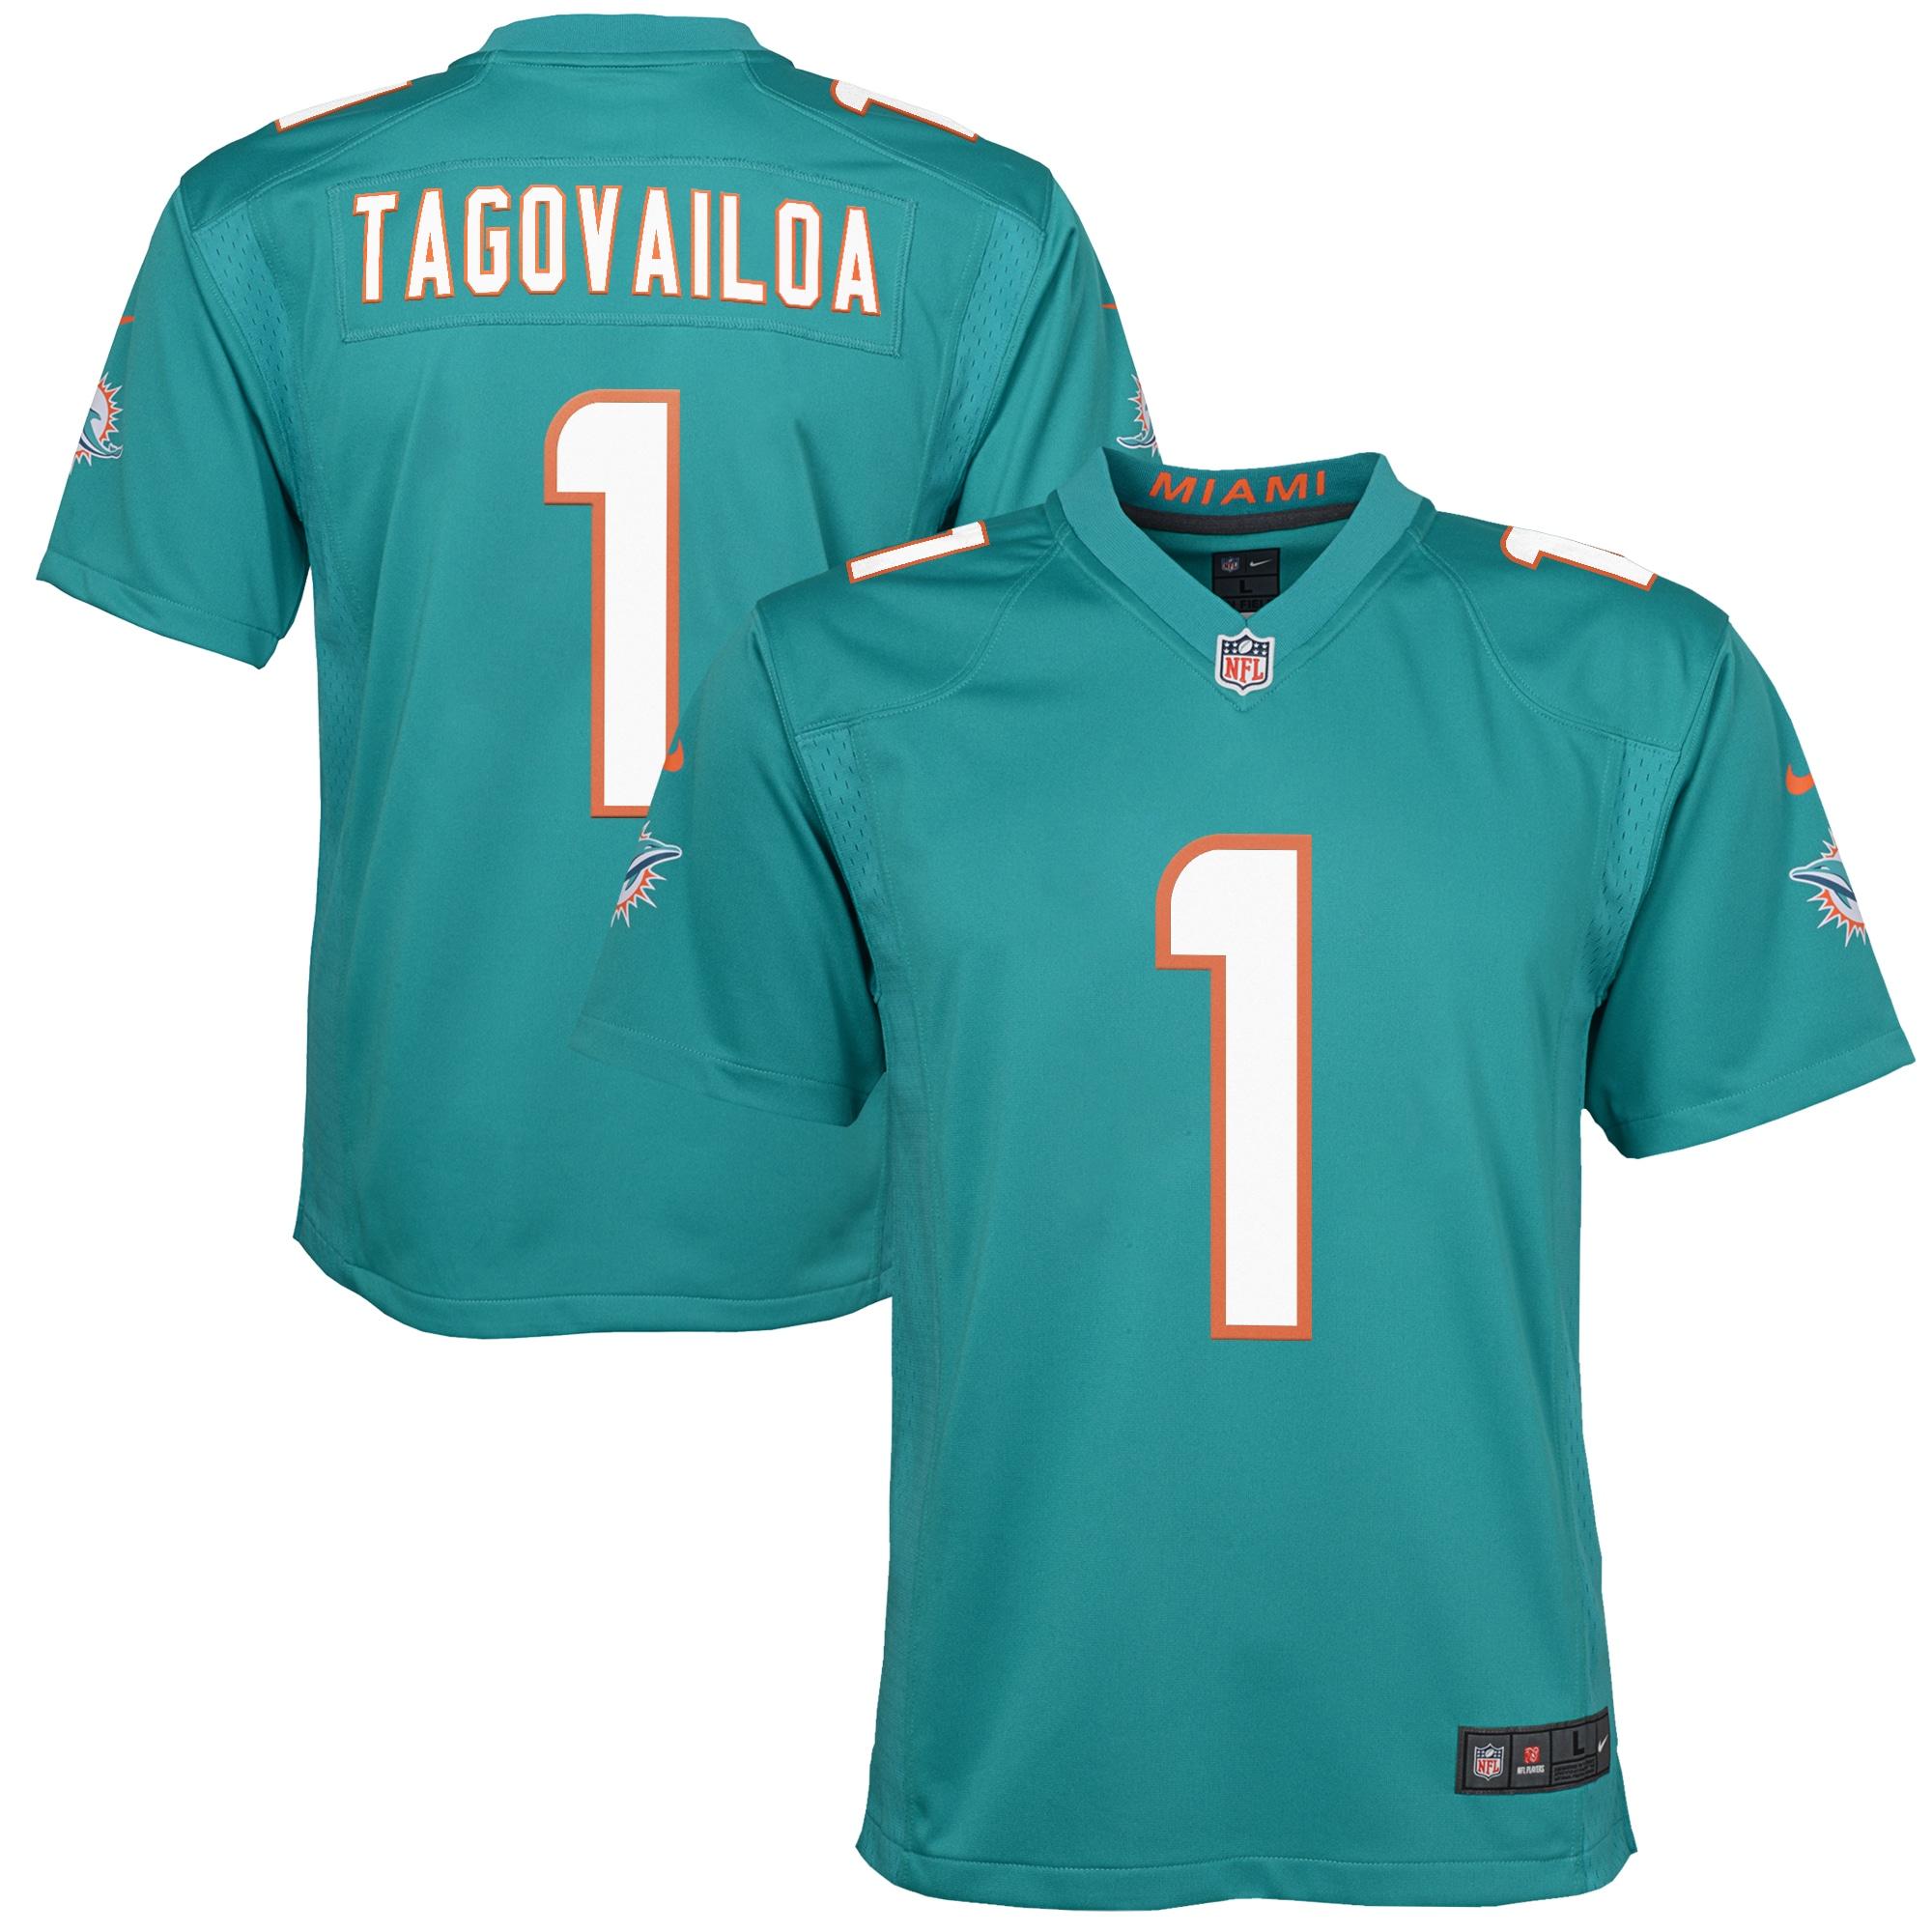 Tua Tagovailoa Miami Dolphins Nike Youth 2020 NFL Draft First Round Pick Game Jersey - Aqua